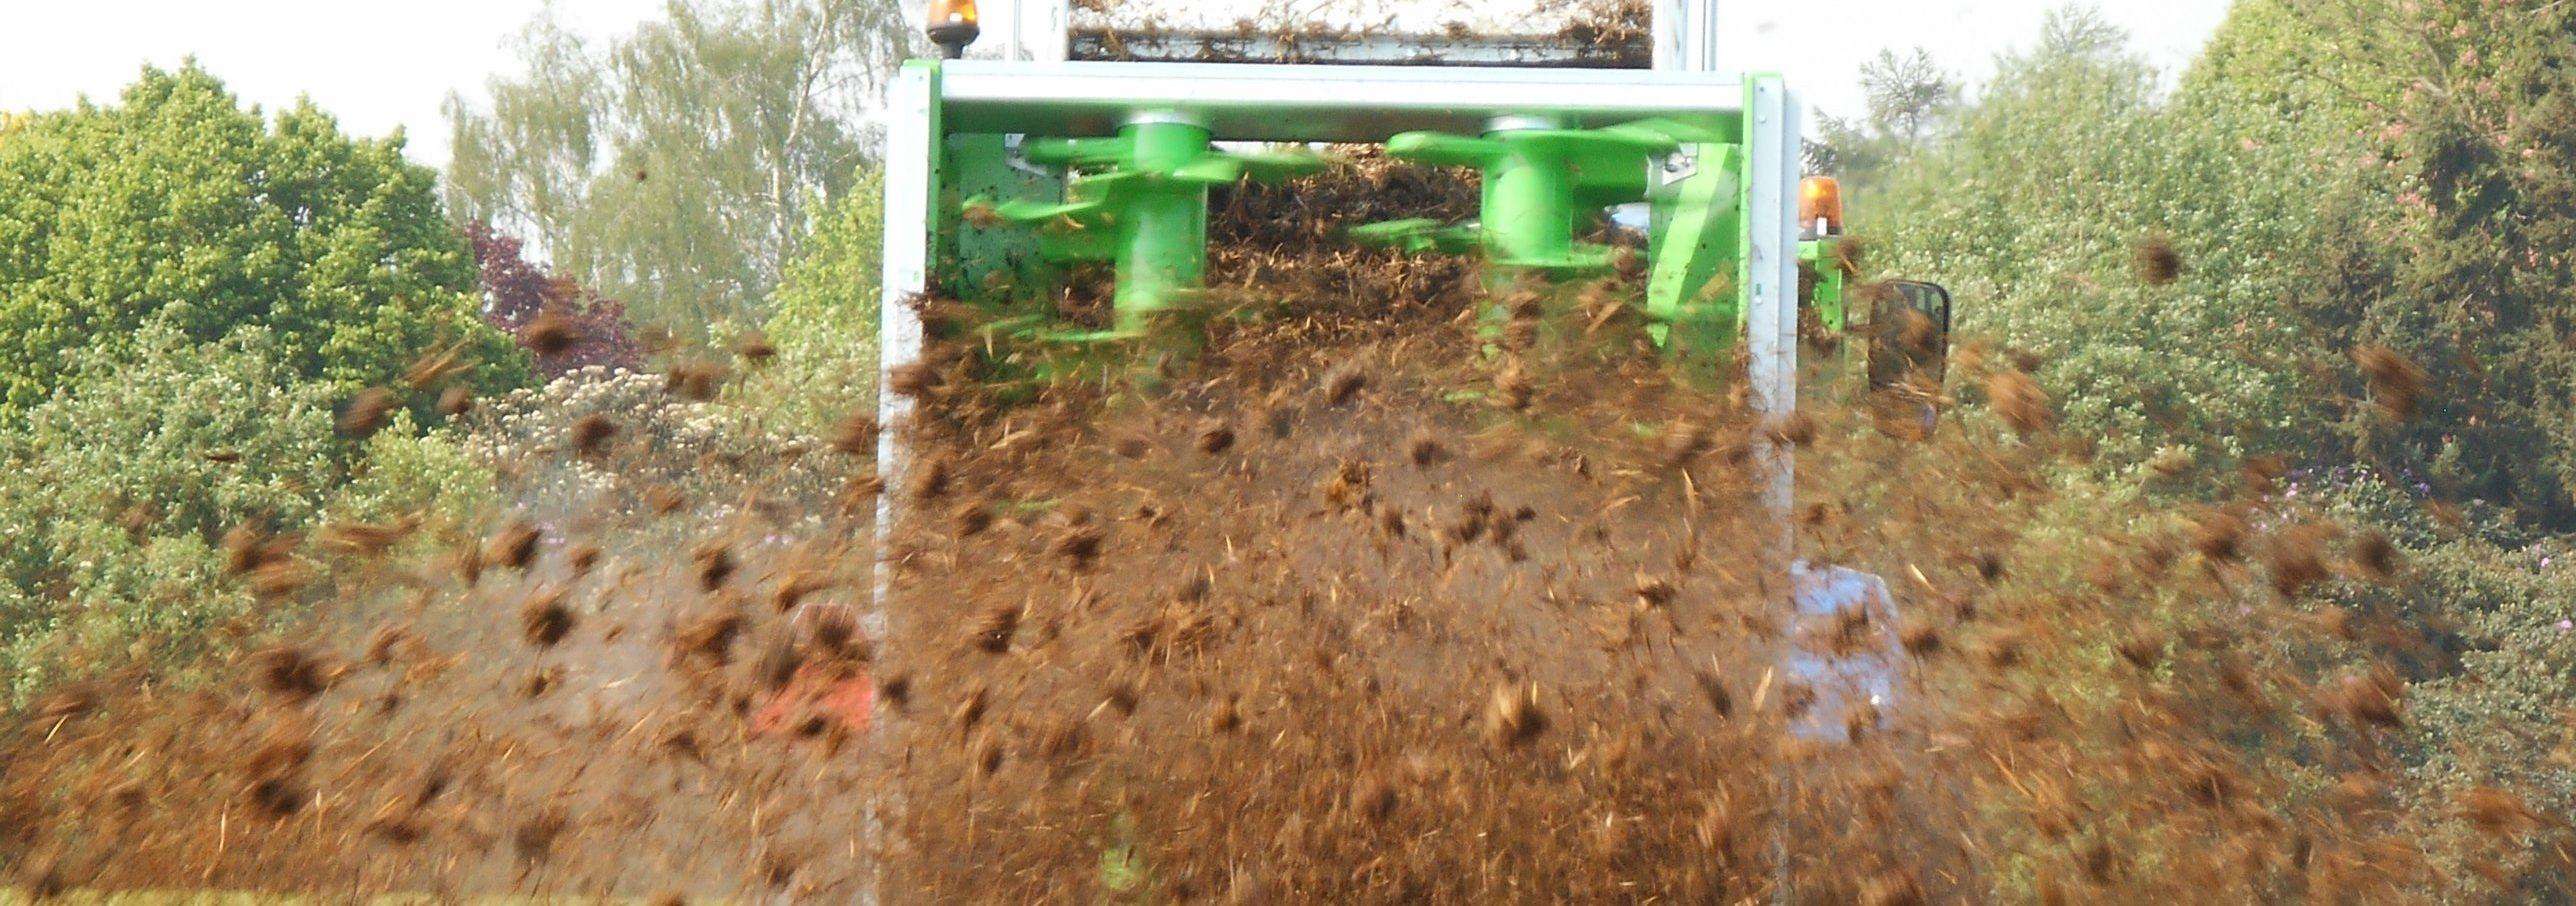 Landbouwers lappen mestwetgeving aan hun laars